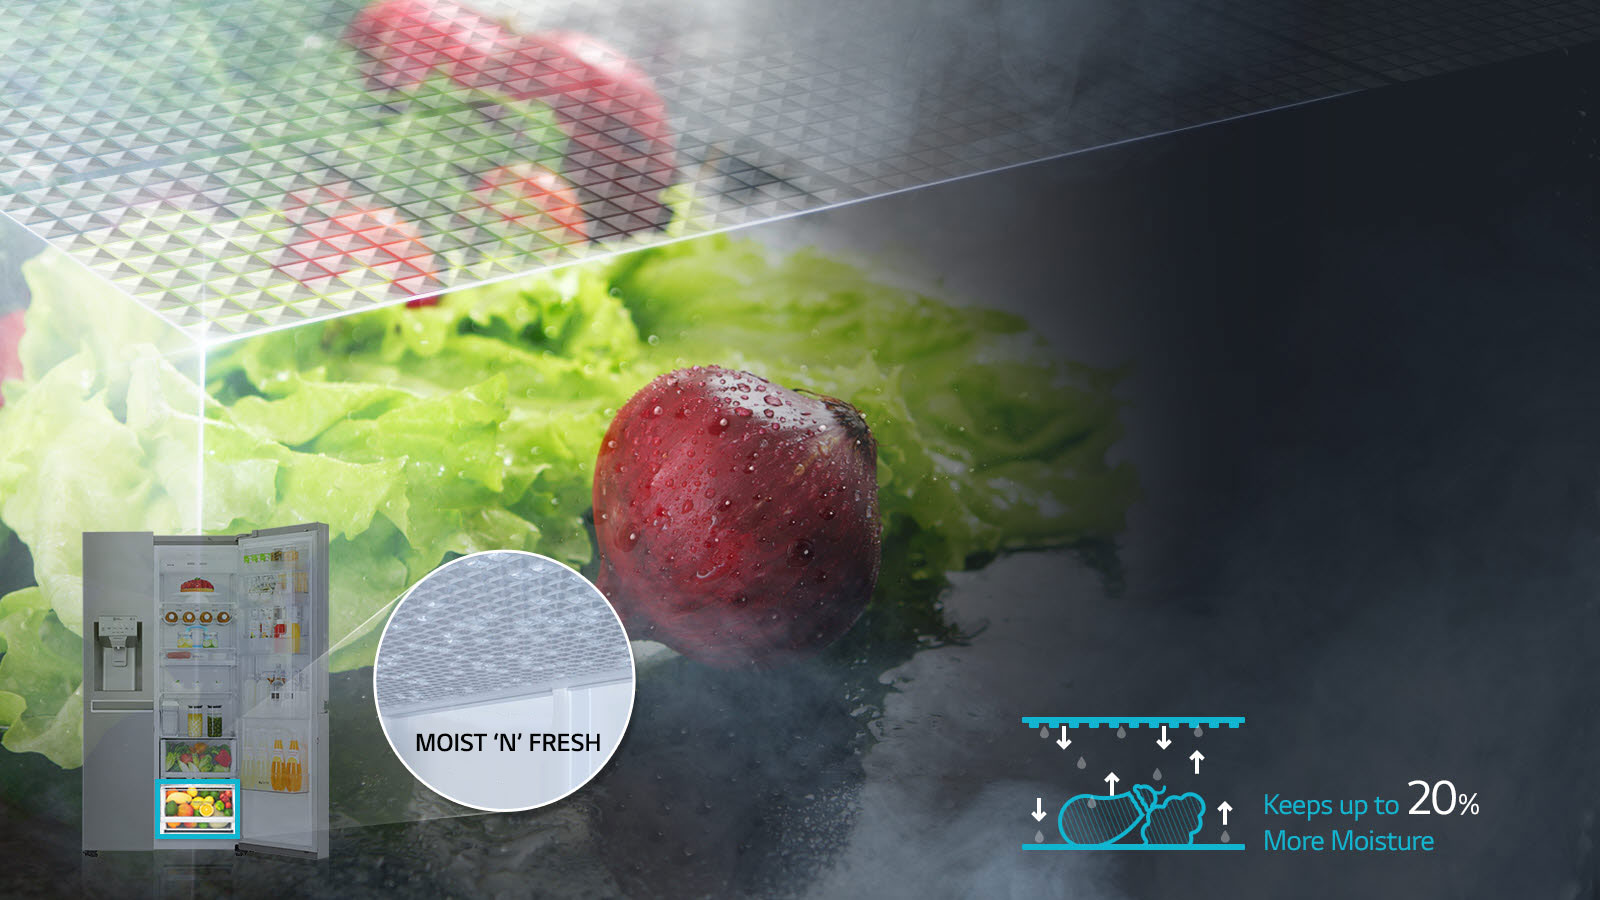 LG MOIST 'N' FRESH Refrigerator